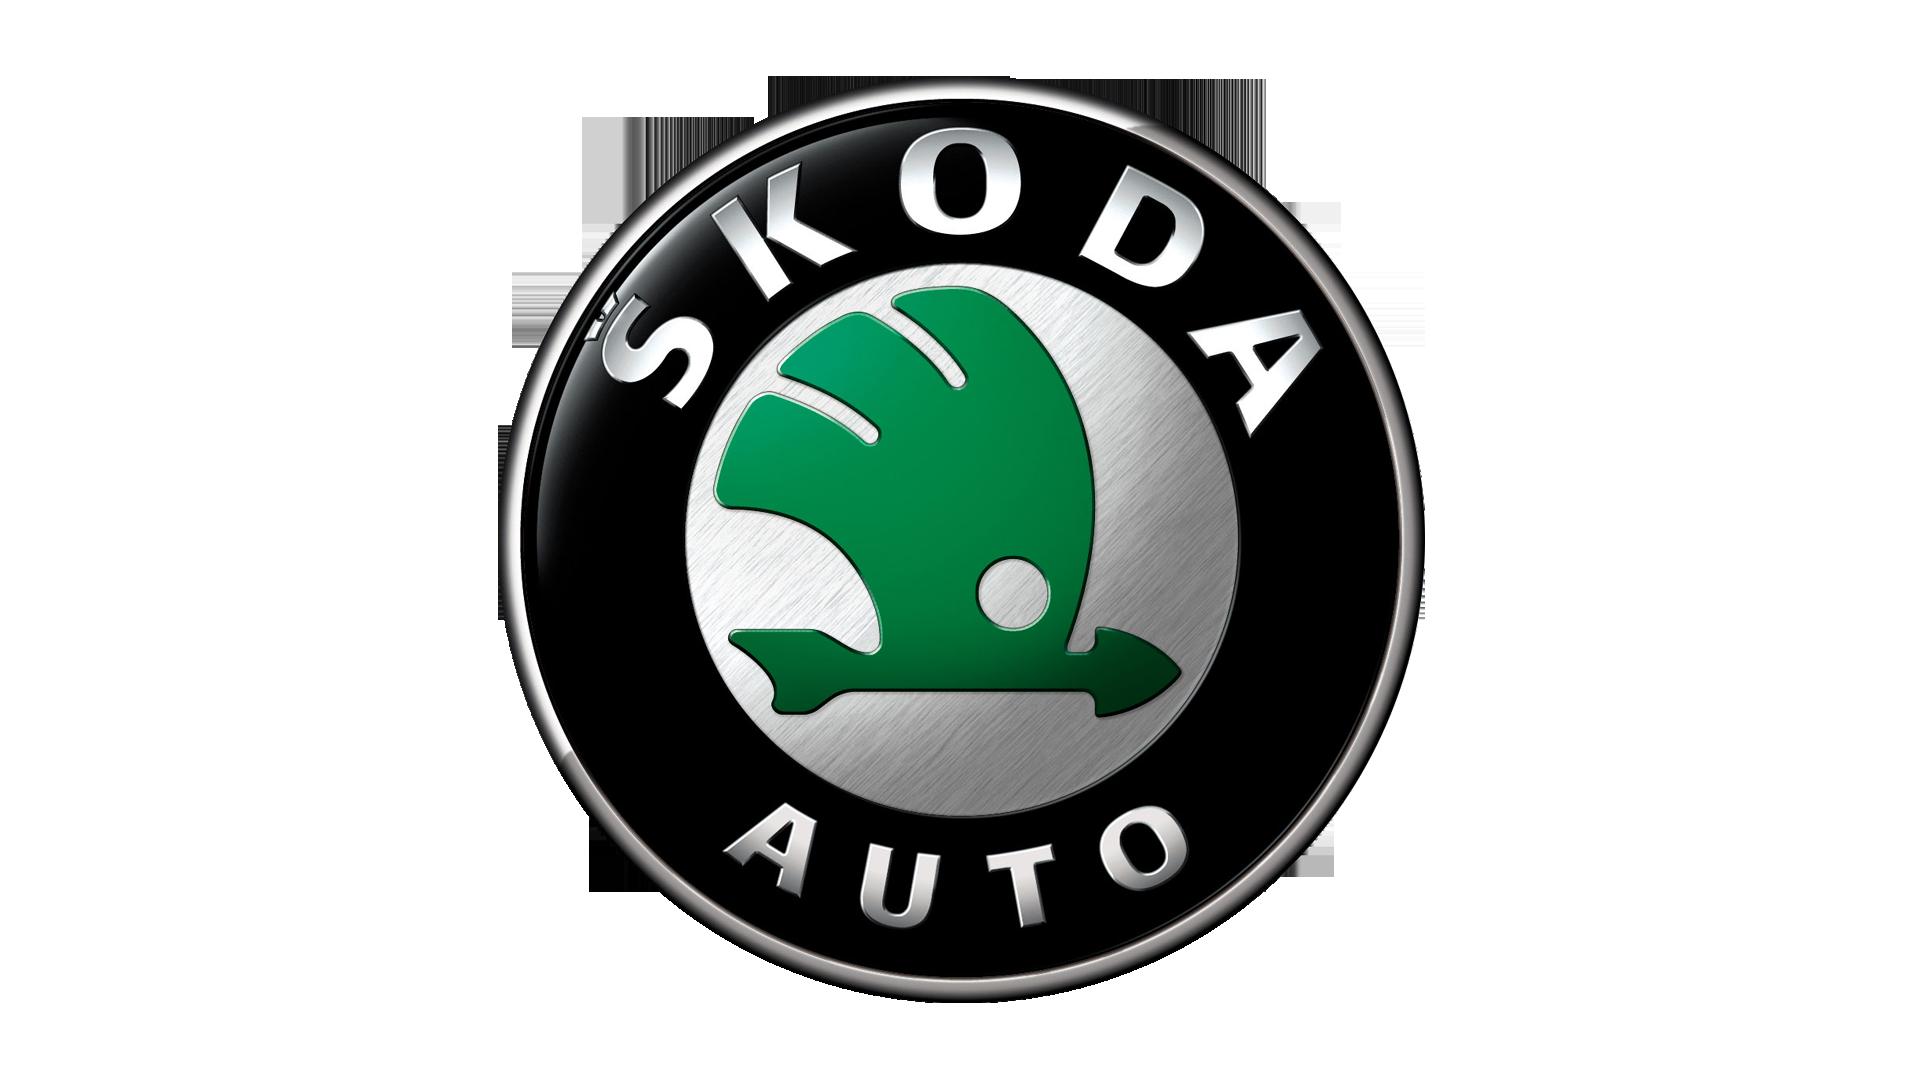 Skoda HD PNG - 117551